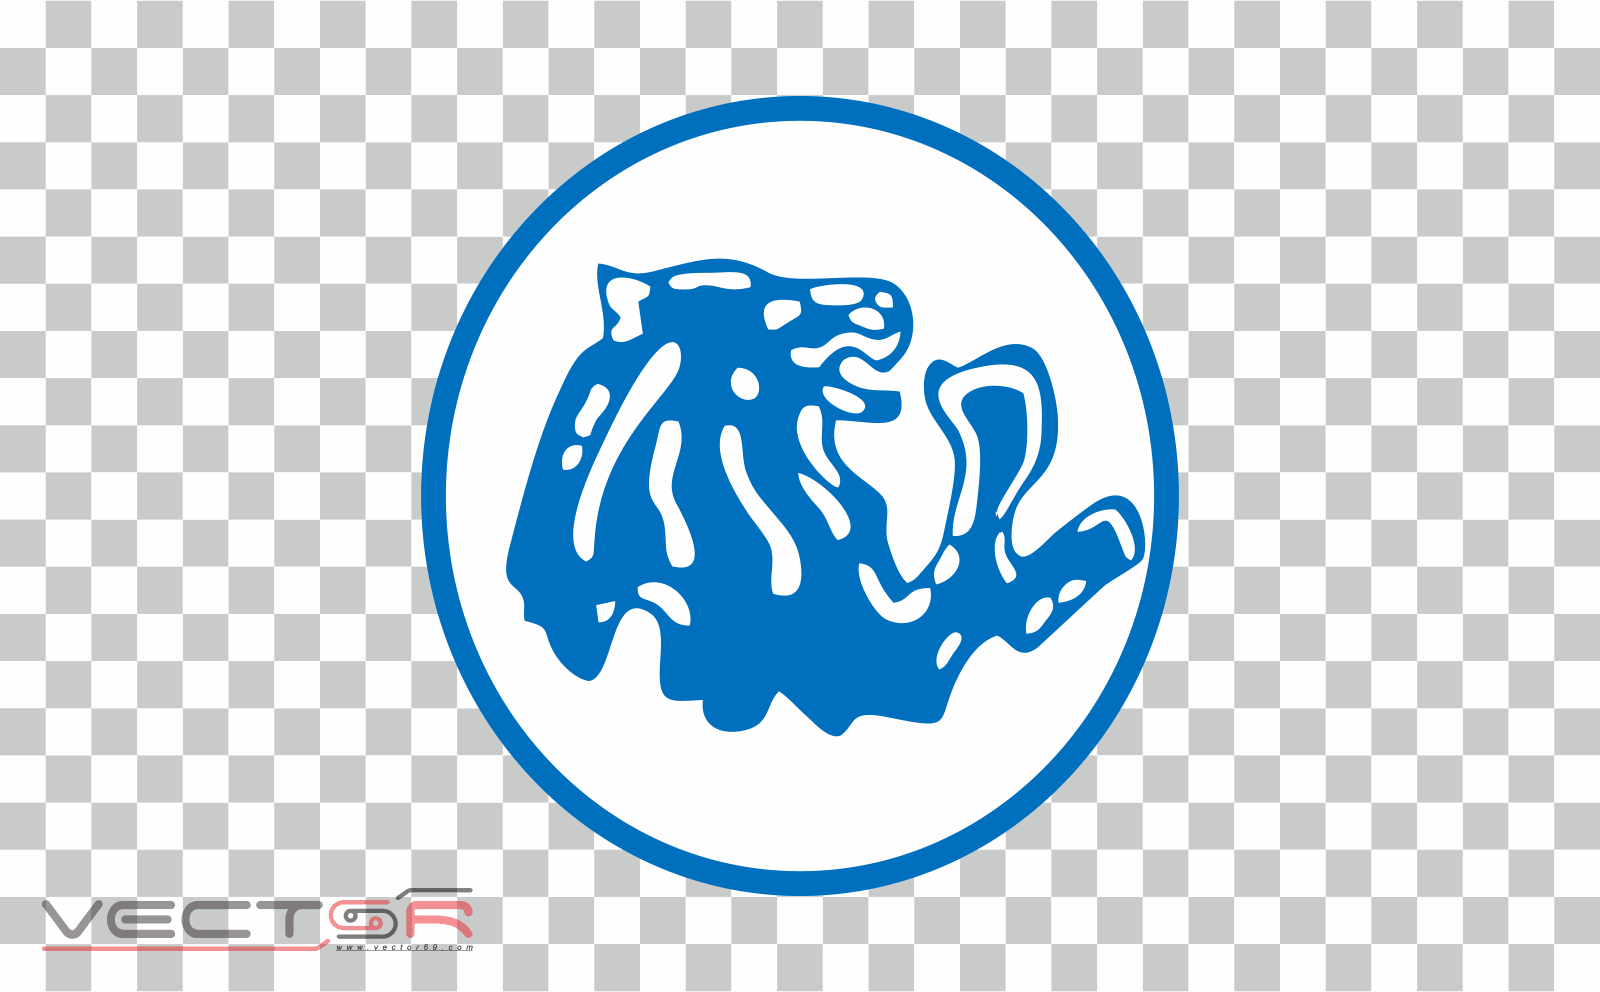 PS Arema Malang (1987) Logo - Download .PNG (Portable Network Graphics) Transparent Images